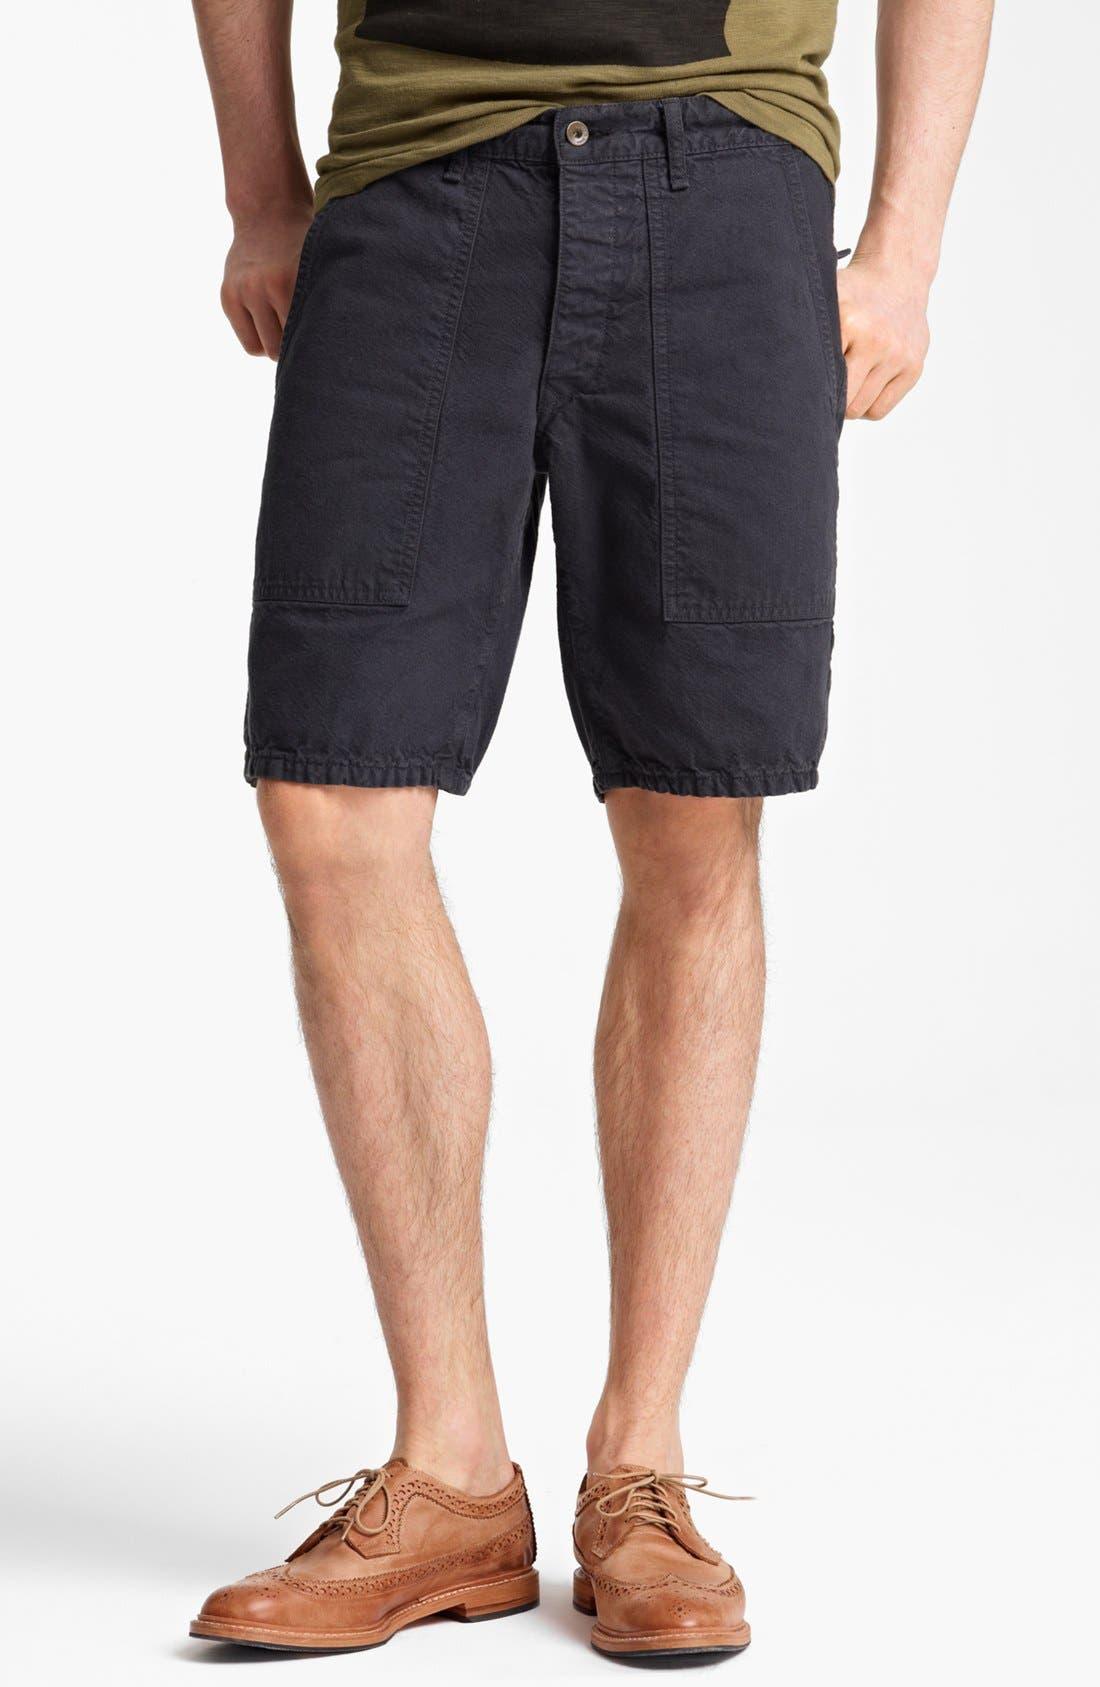 Alternate Image 1 Selected - rag & bone 'Brigade' Shorts